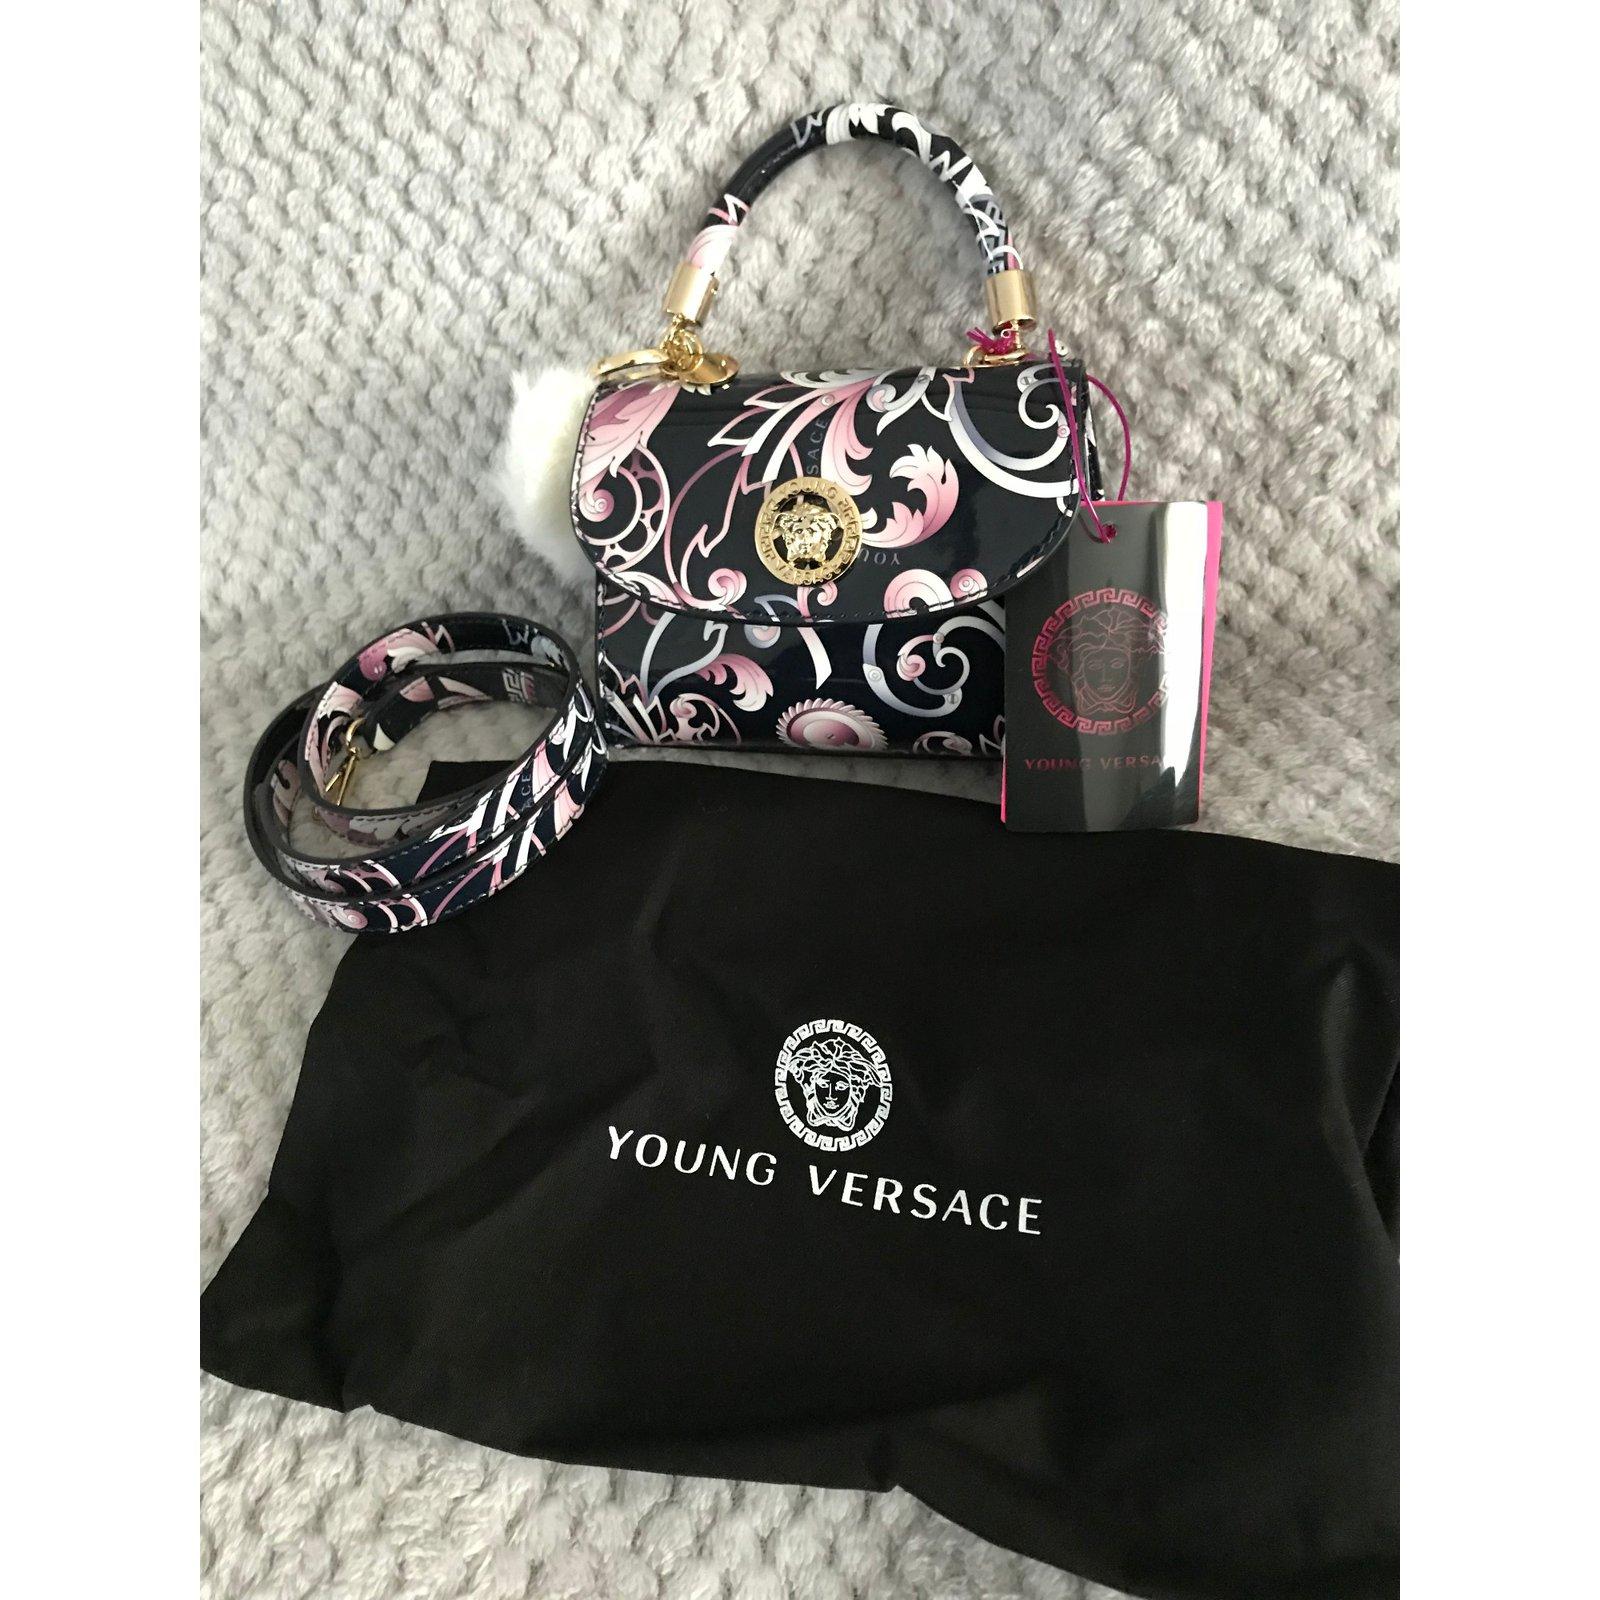 97b95f0730a5 Gianni Versace New Baroque Young Versace bag Handbags Leather Multiple  colors ref.58048 - Joli Closet